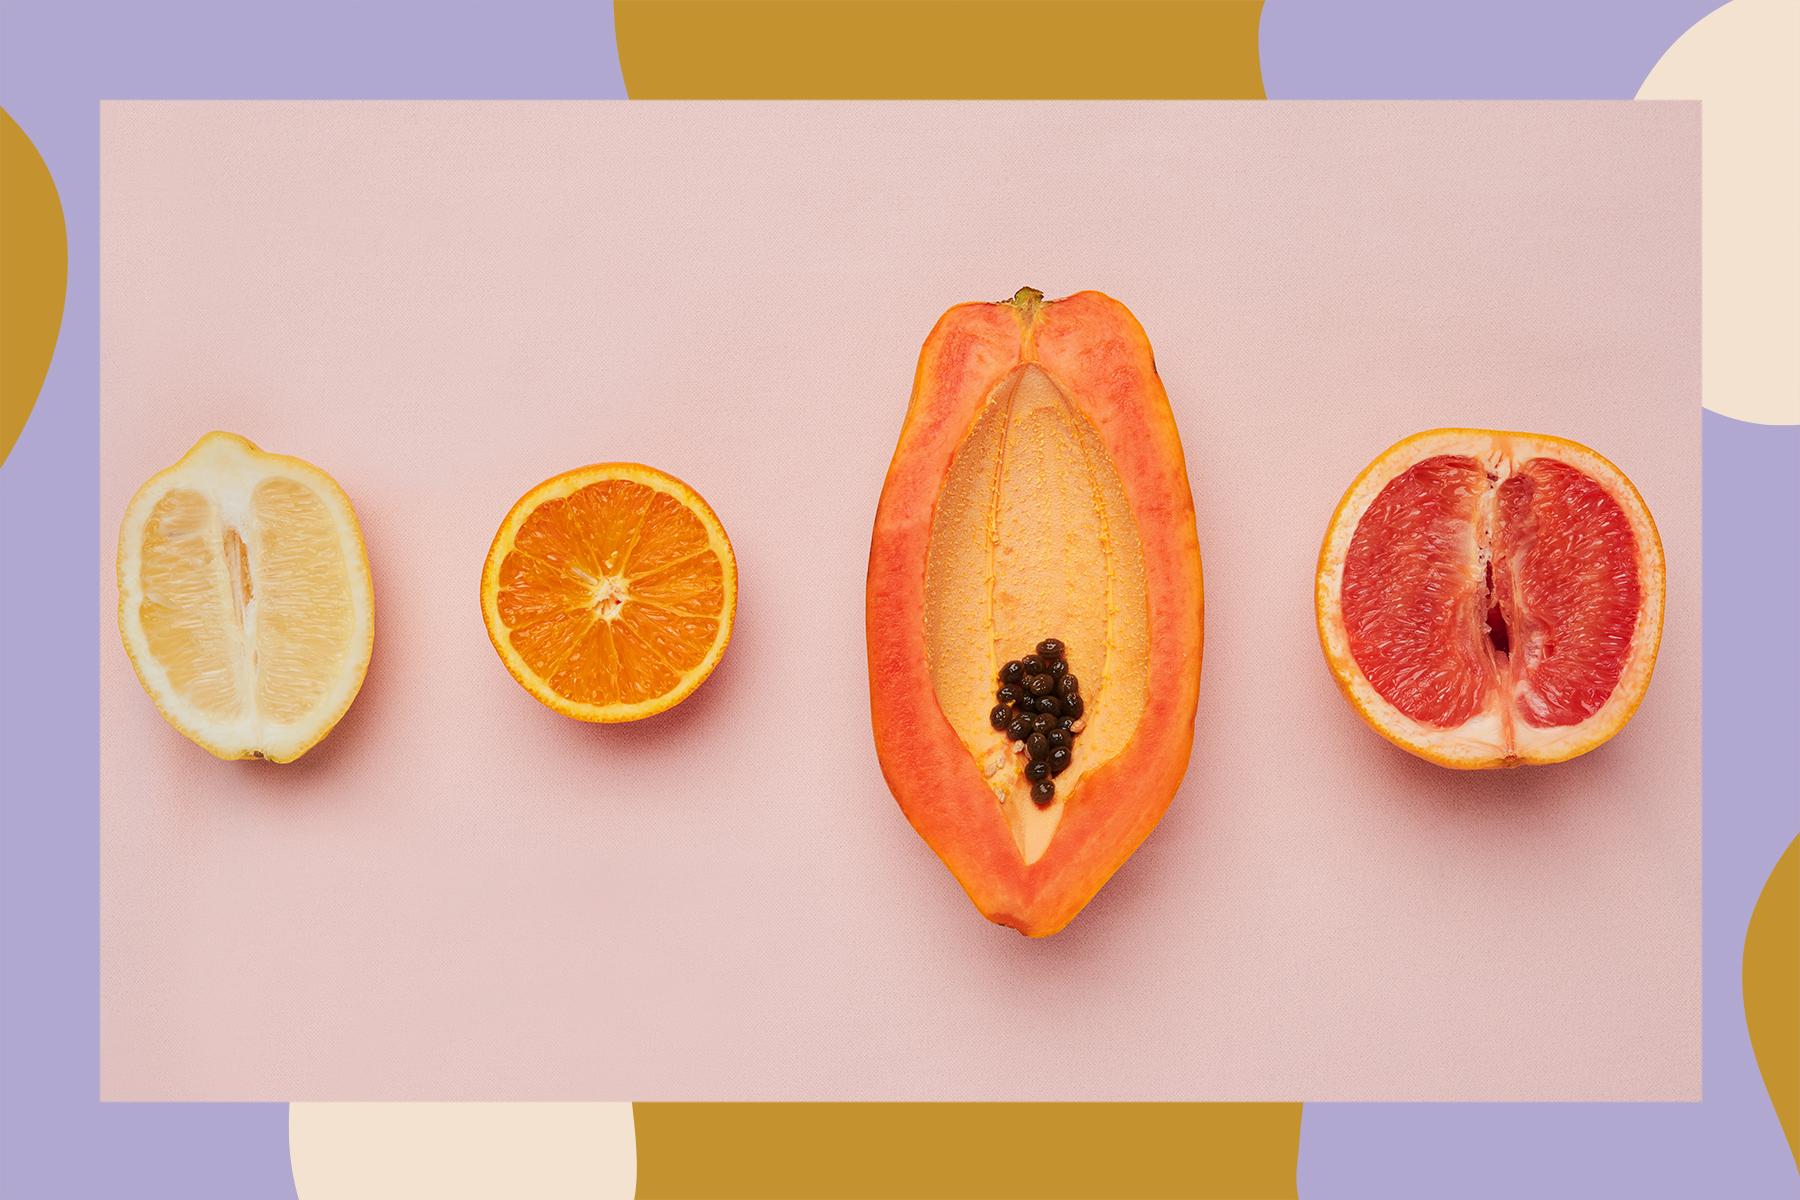 best foods for vaginal health